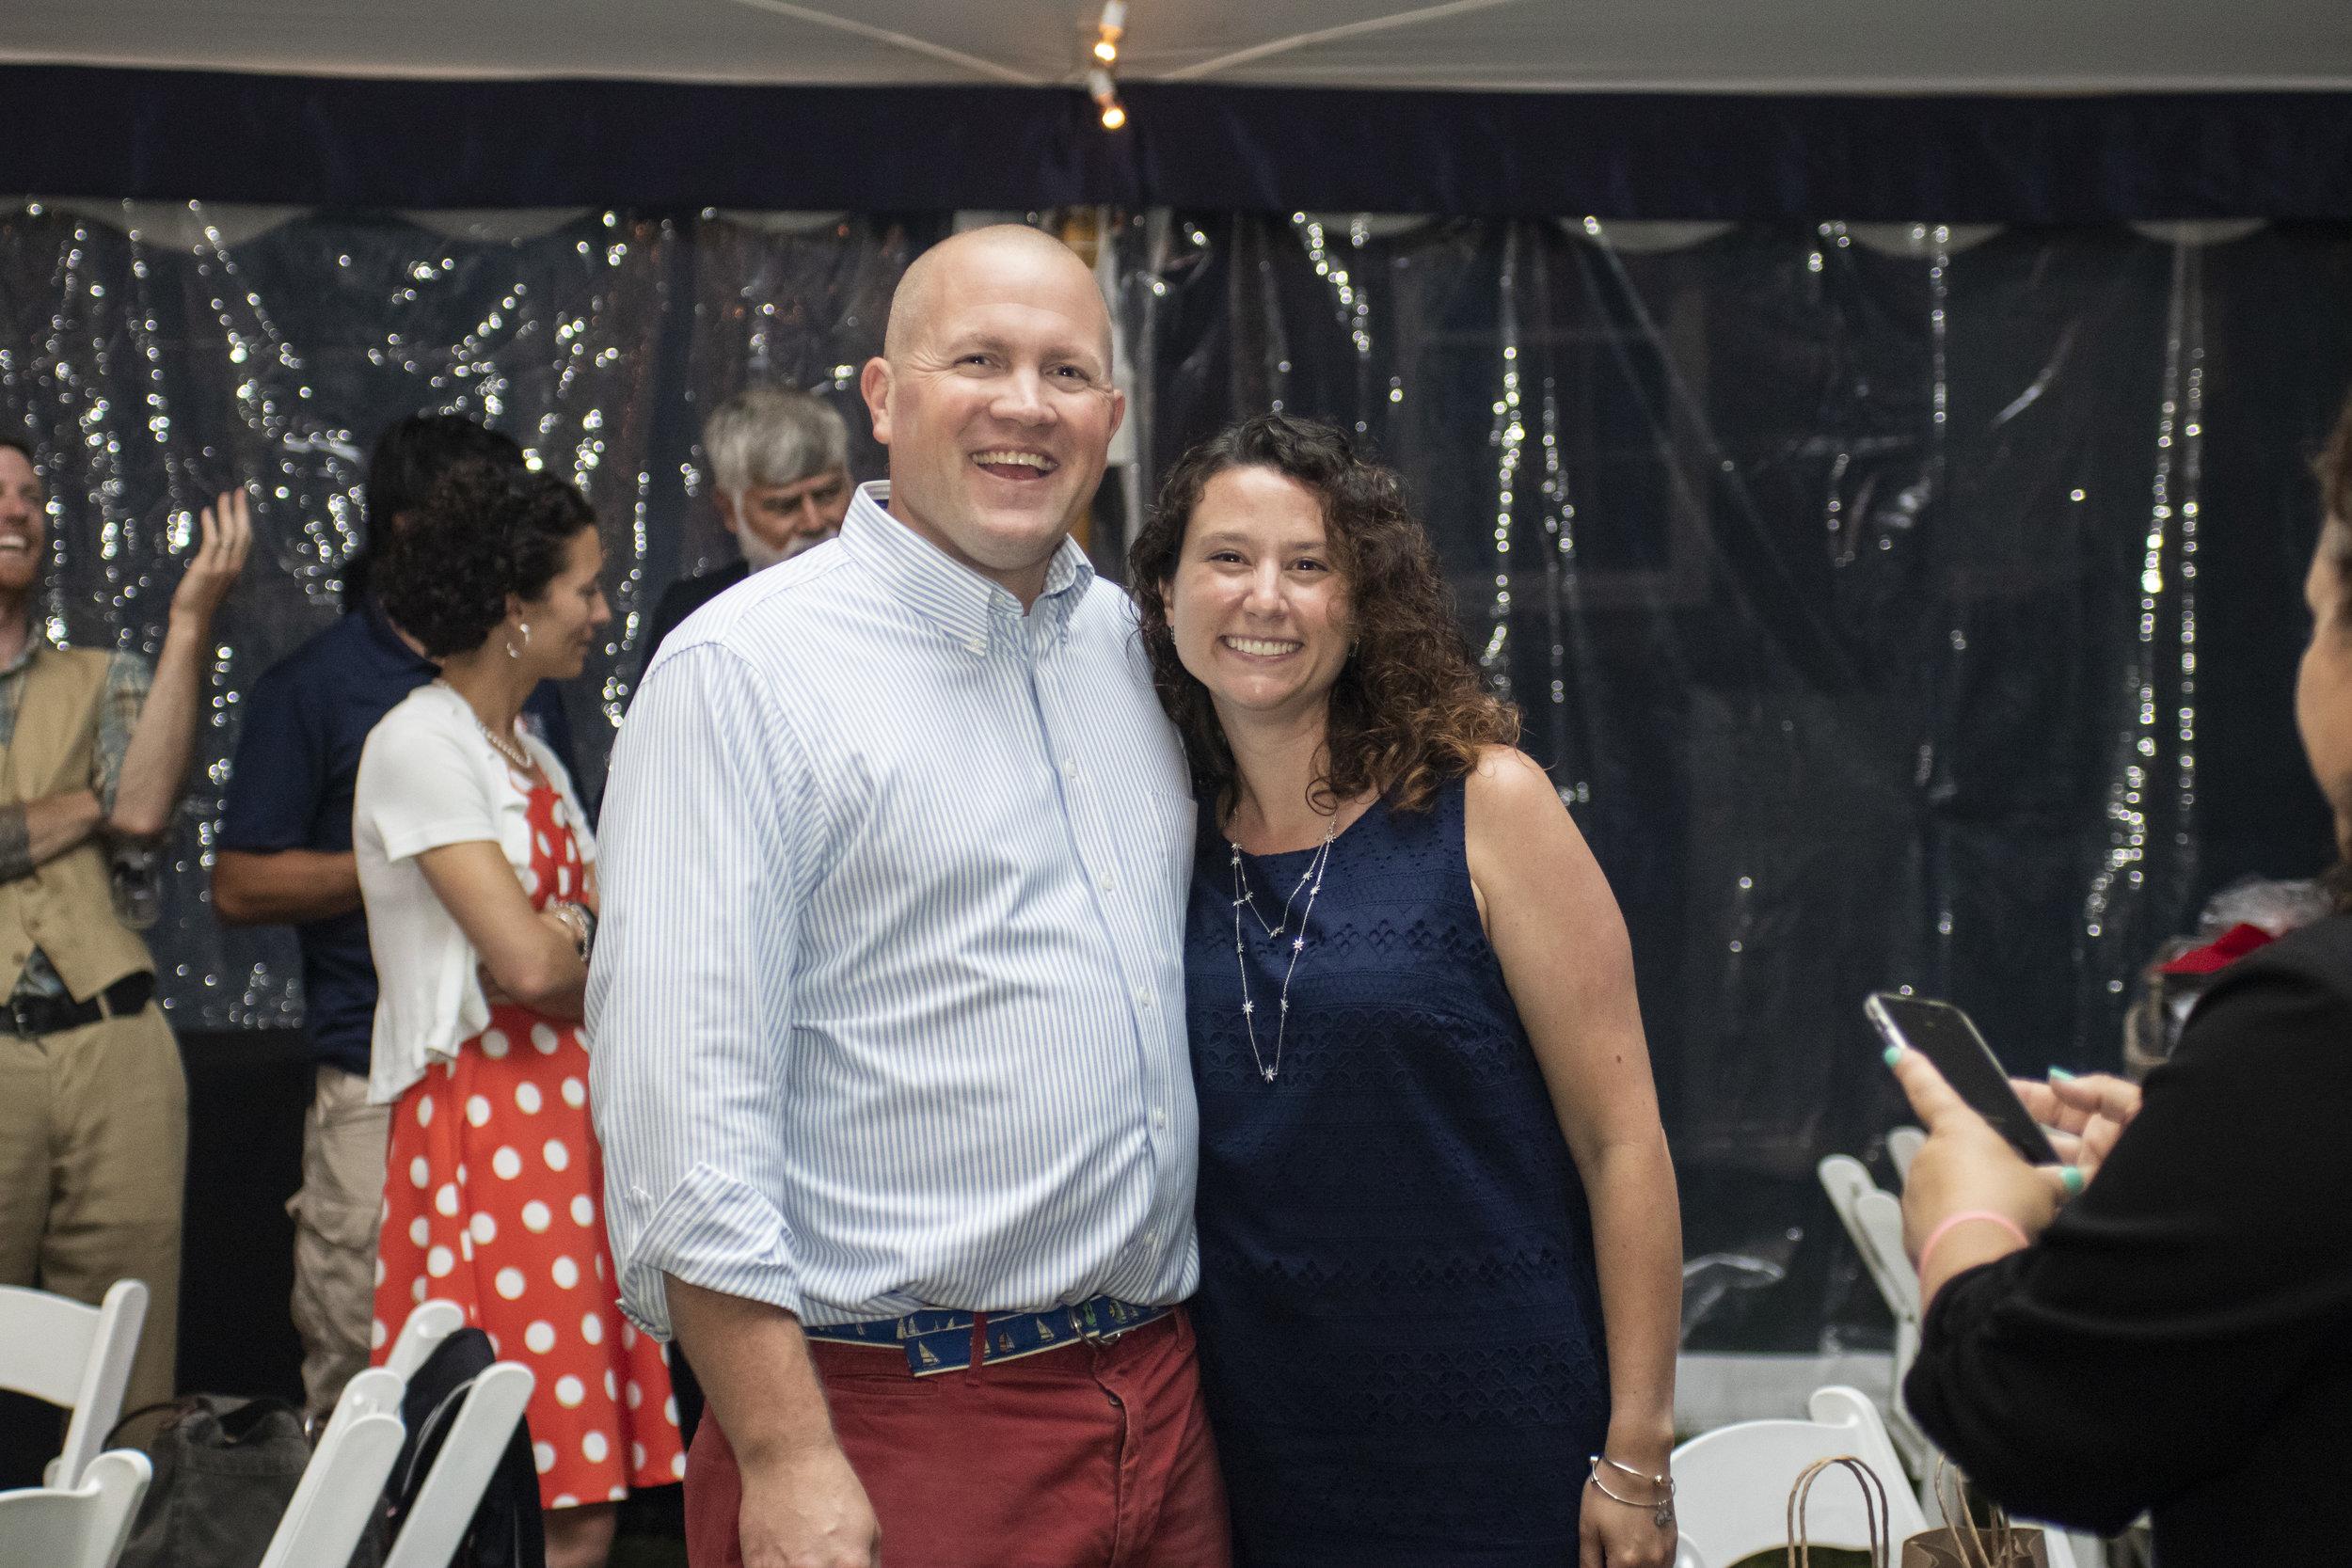 257 - Craig and Allison Parkhurst.jpg